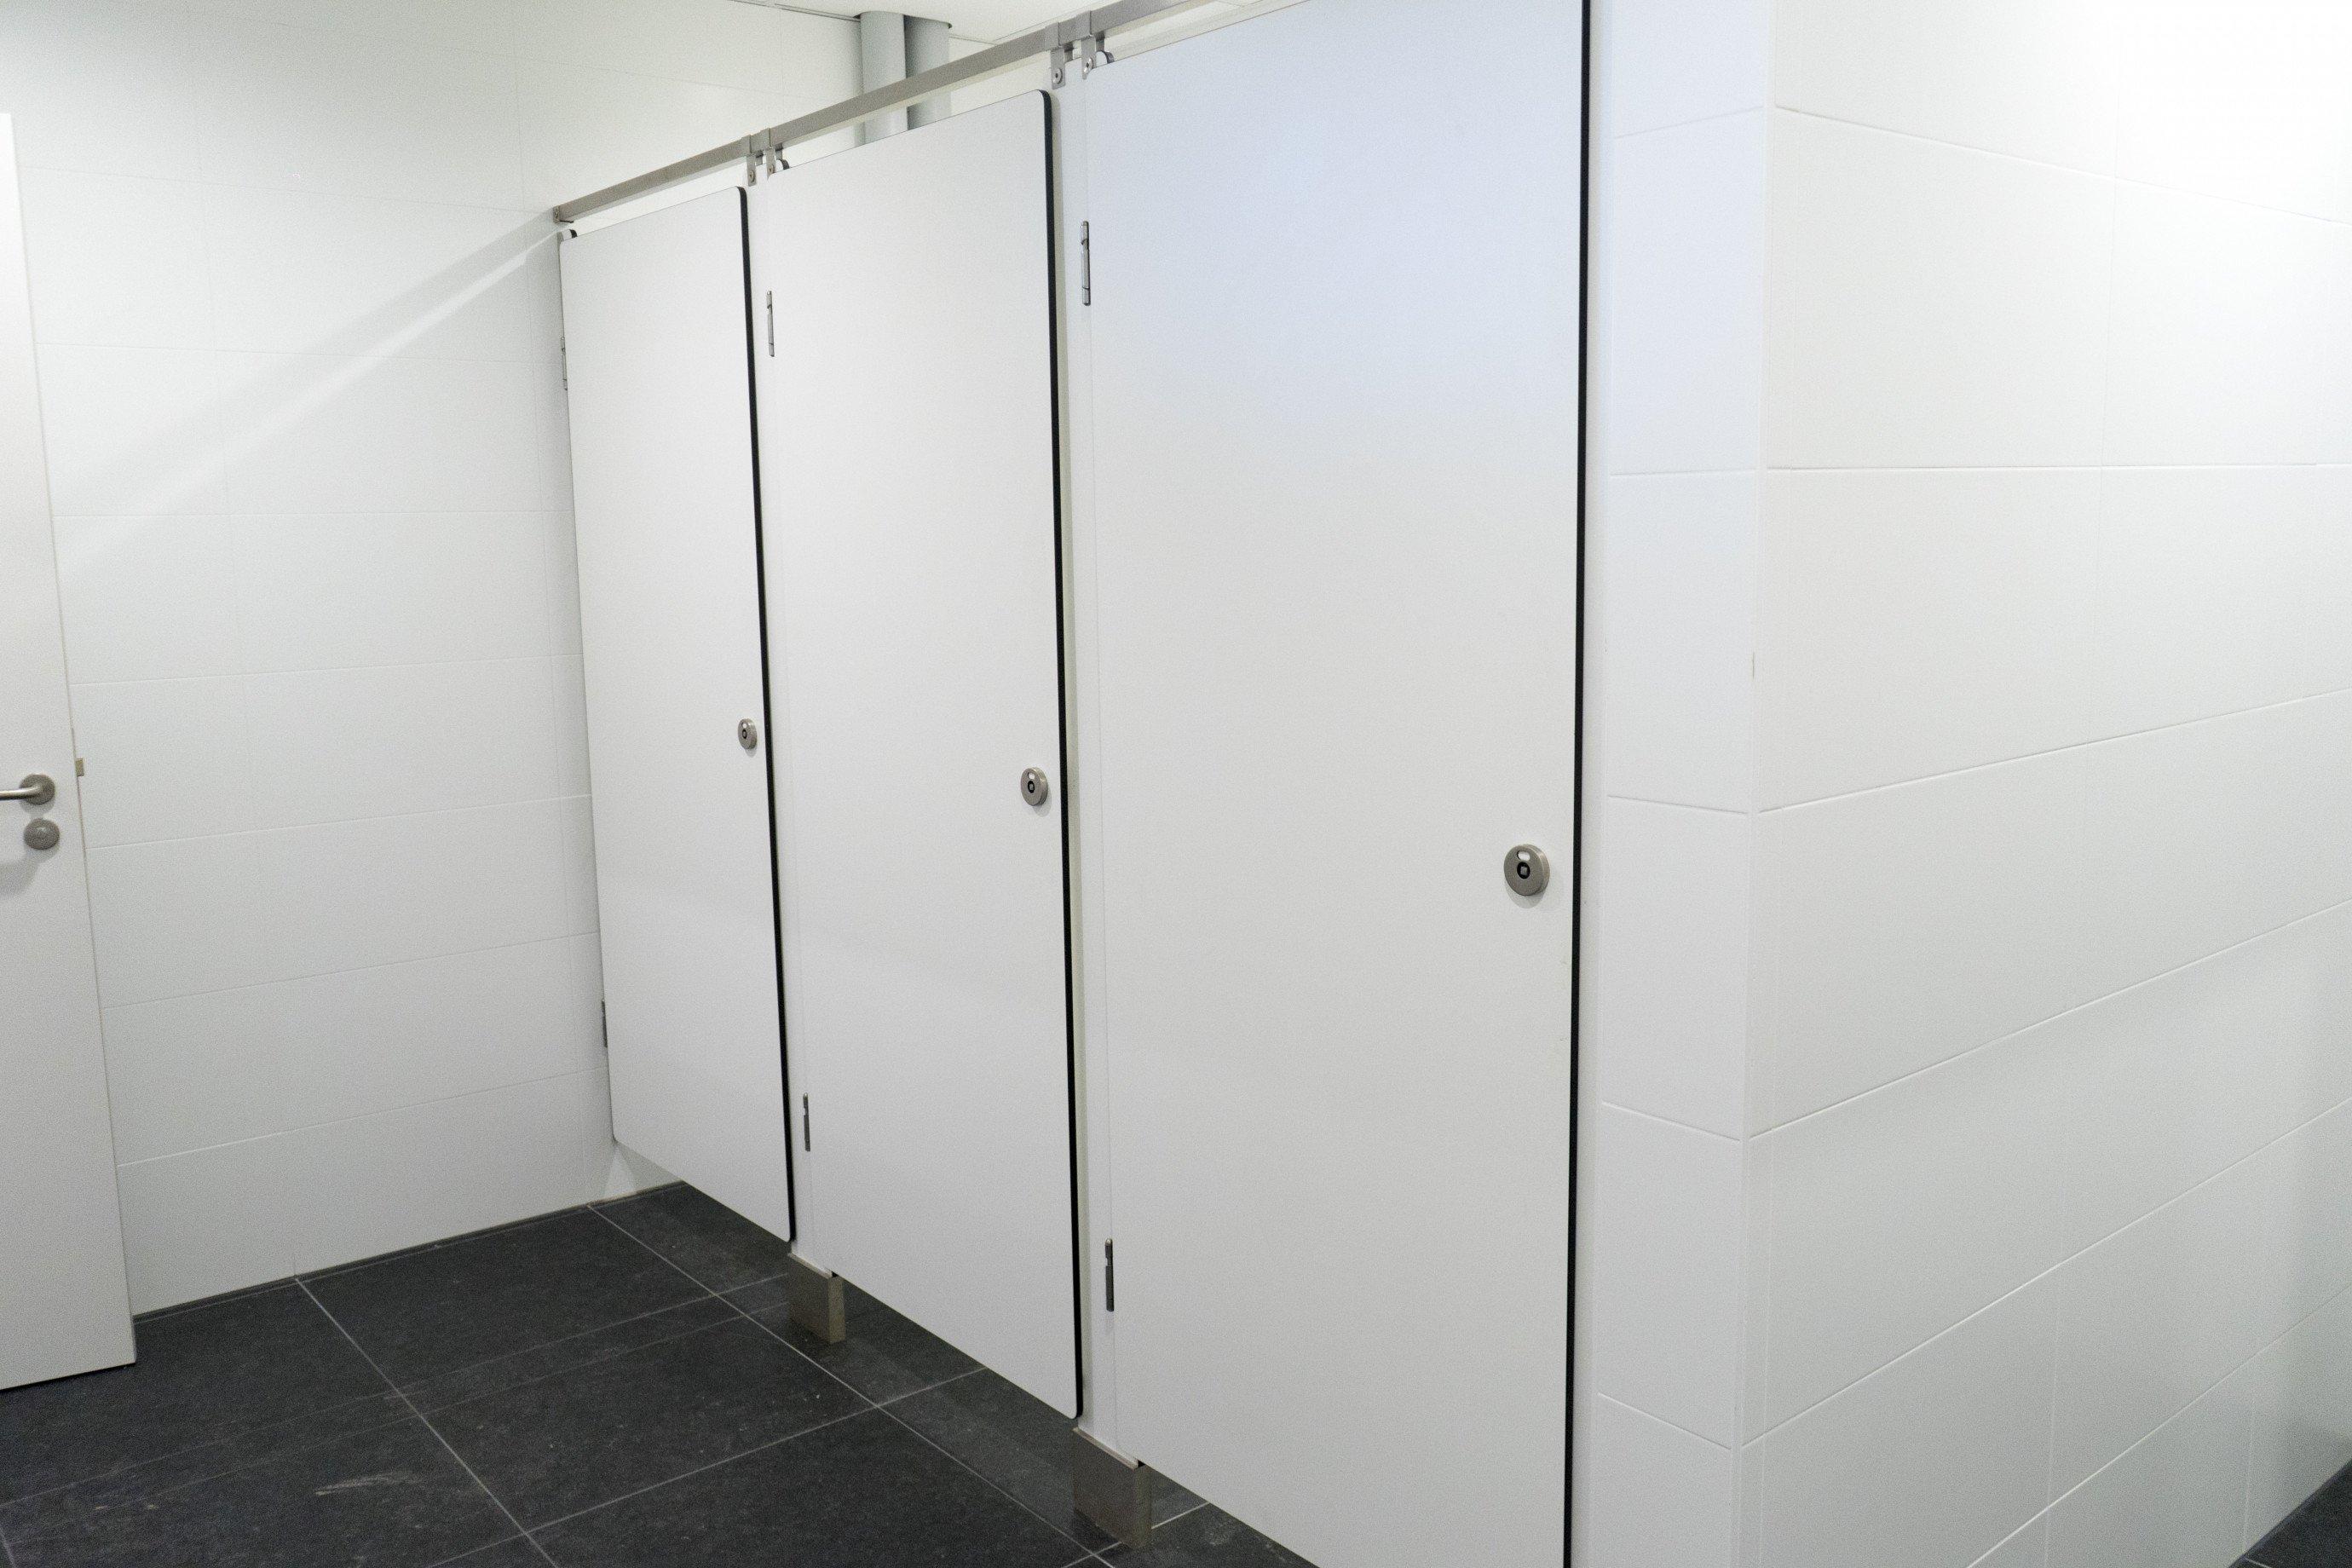 Afwerking toiletten in samenwerking met Intersan